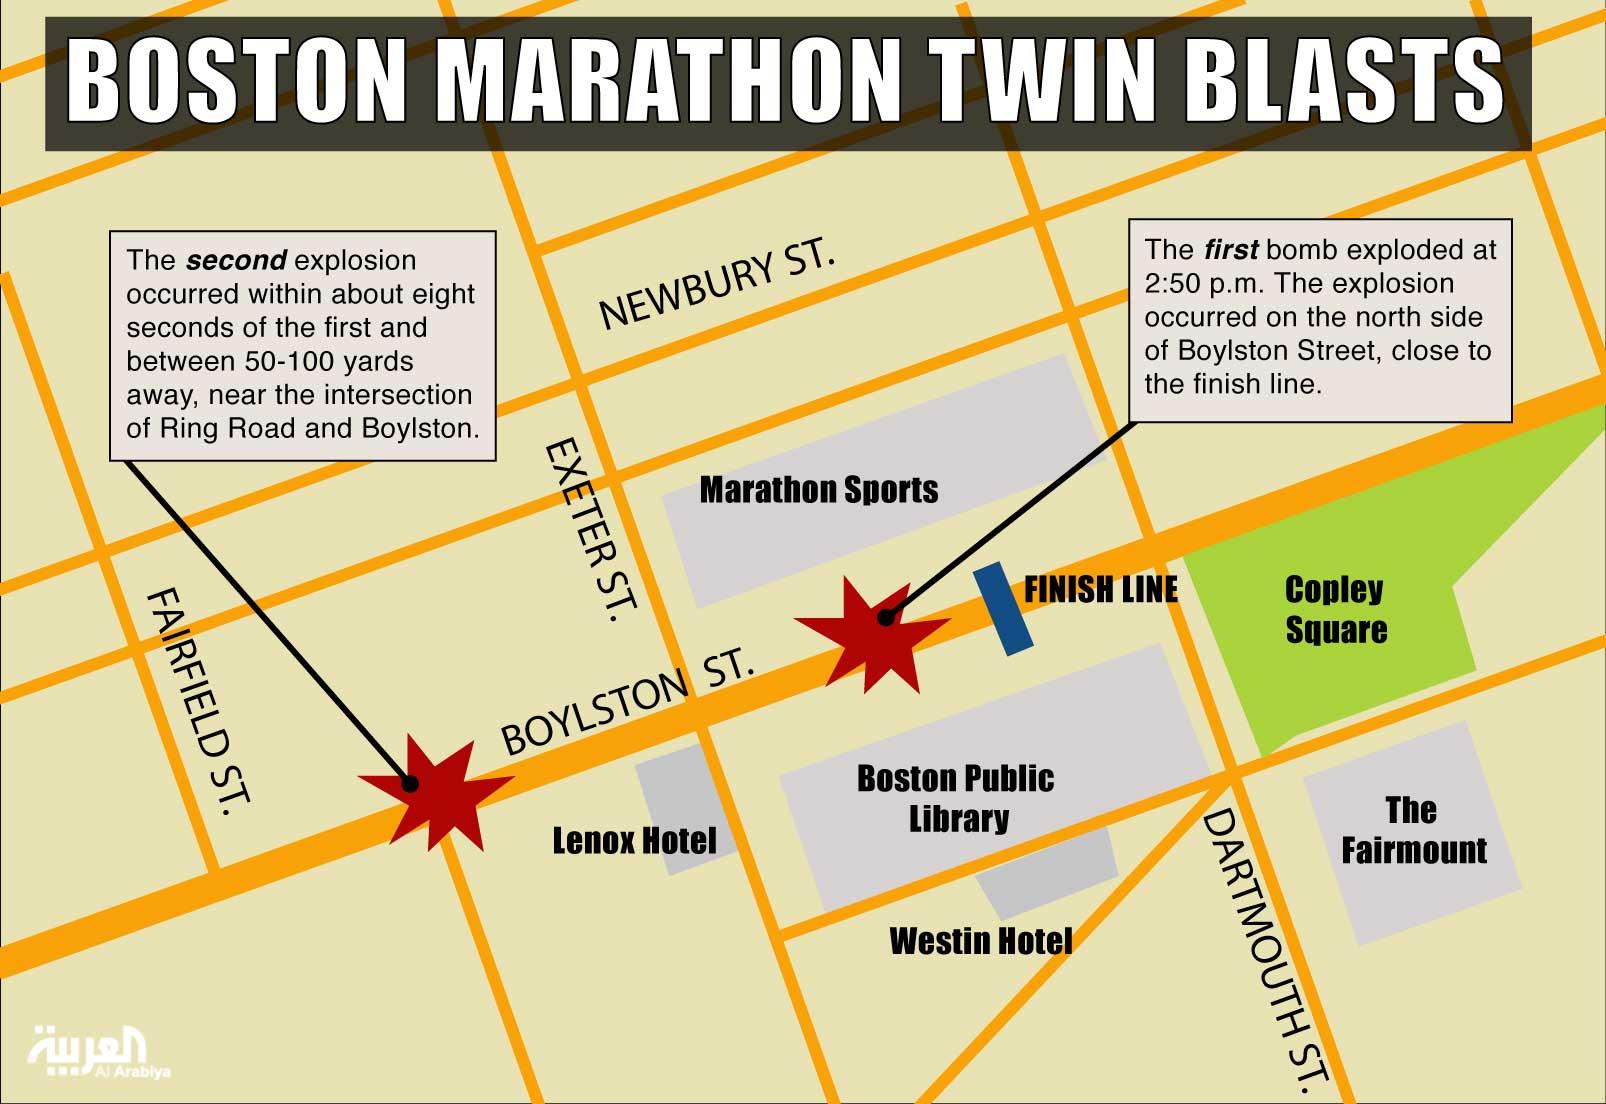 Info graphic: Boston Marathon twin blasts (Design by Farwa Rizwan / Al Arabiya)